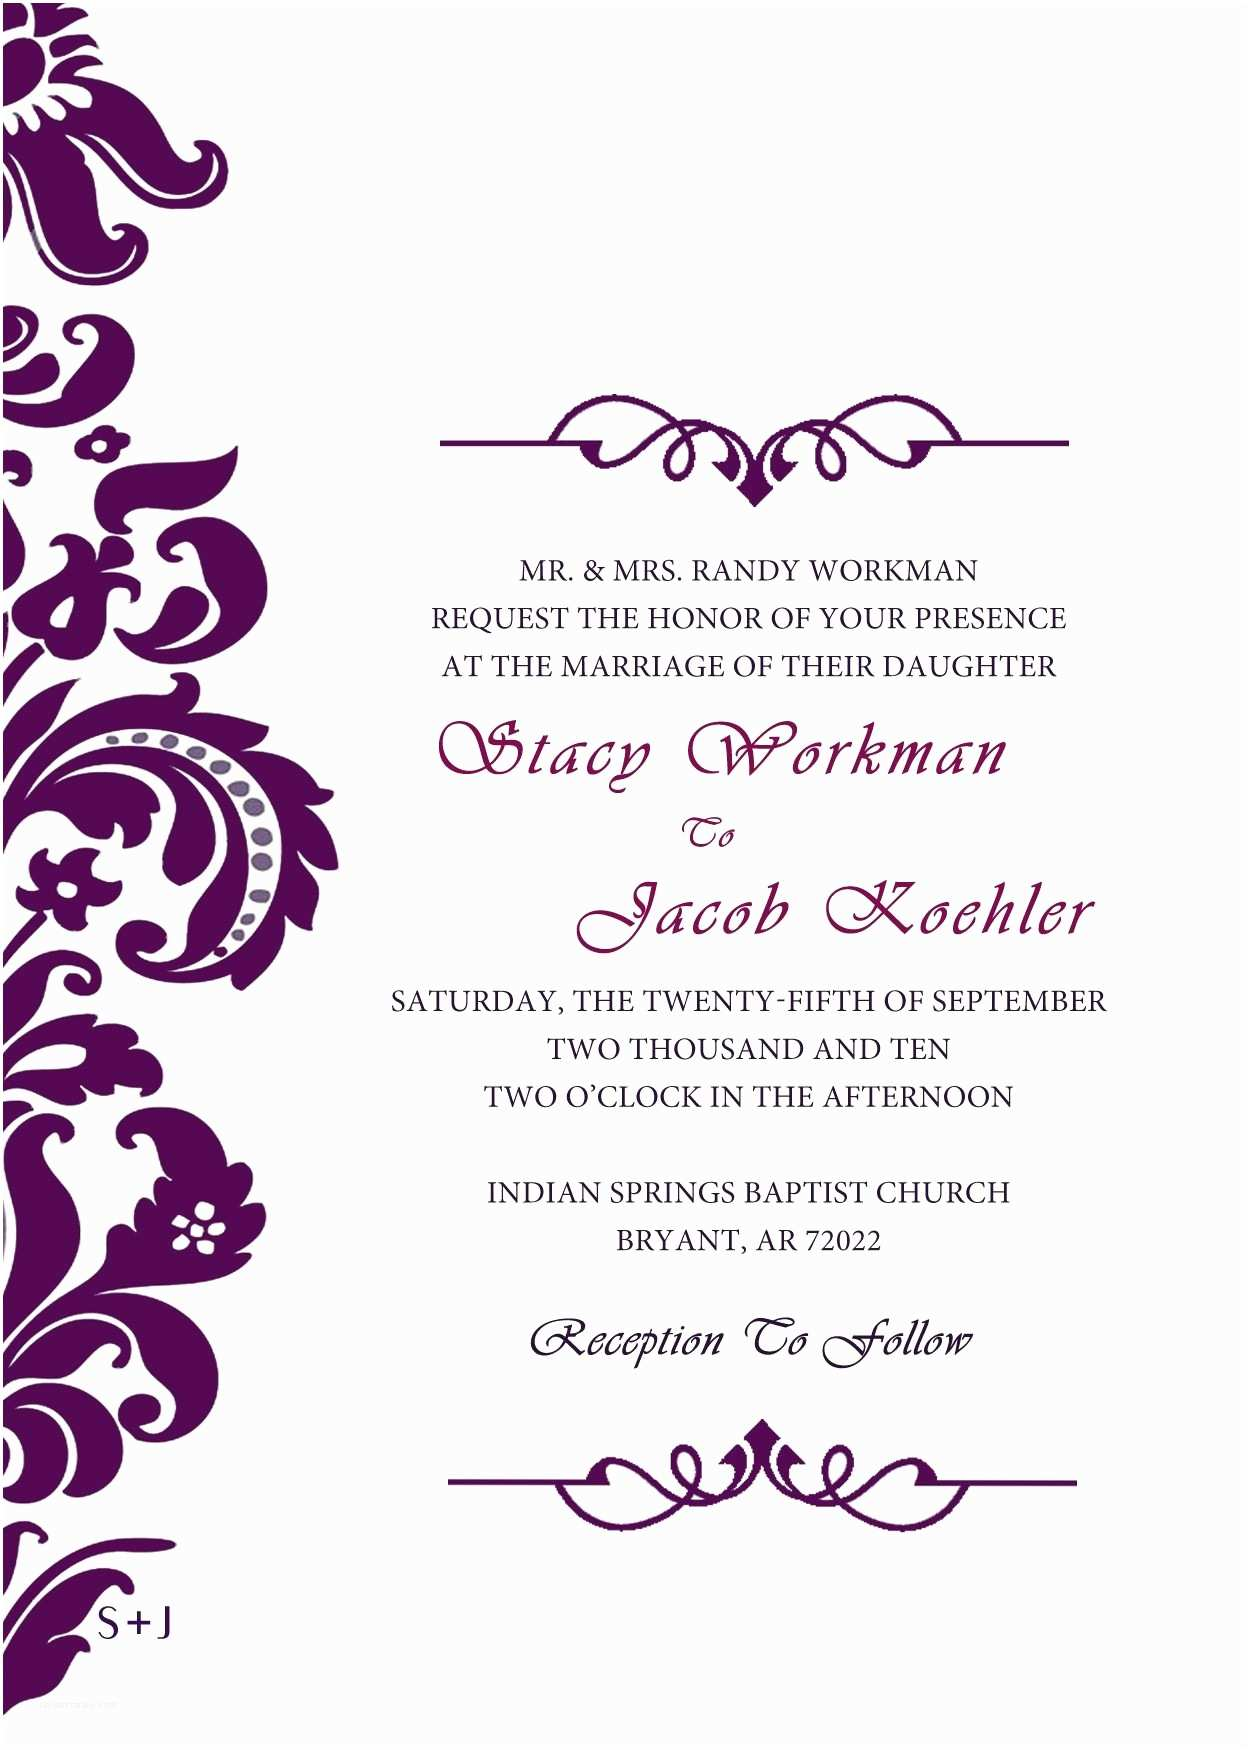 Wedding Invitation Design Images Wedding Invitations Cards Marriage Invitation